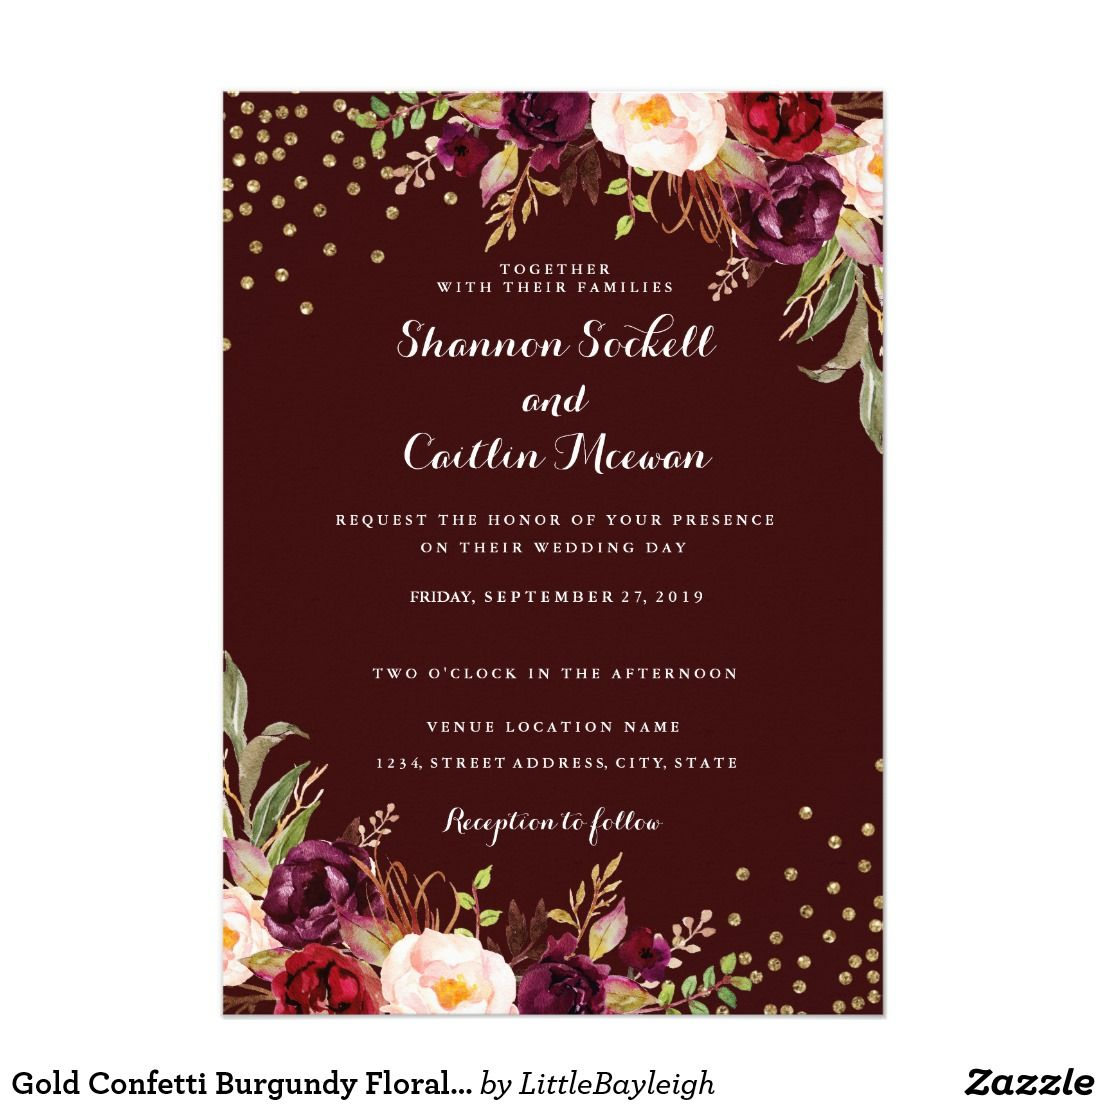 Gold Confetti Burgundy Floral Wedding Invitation Zazzle